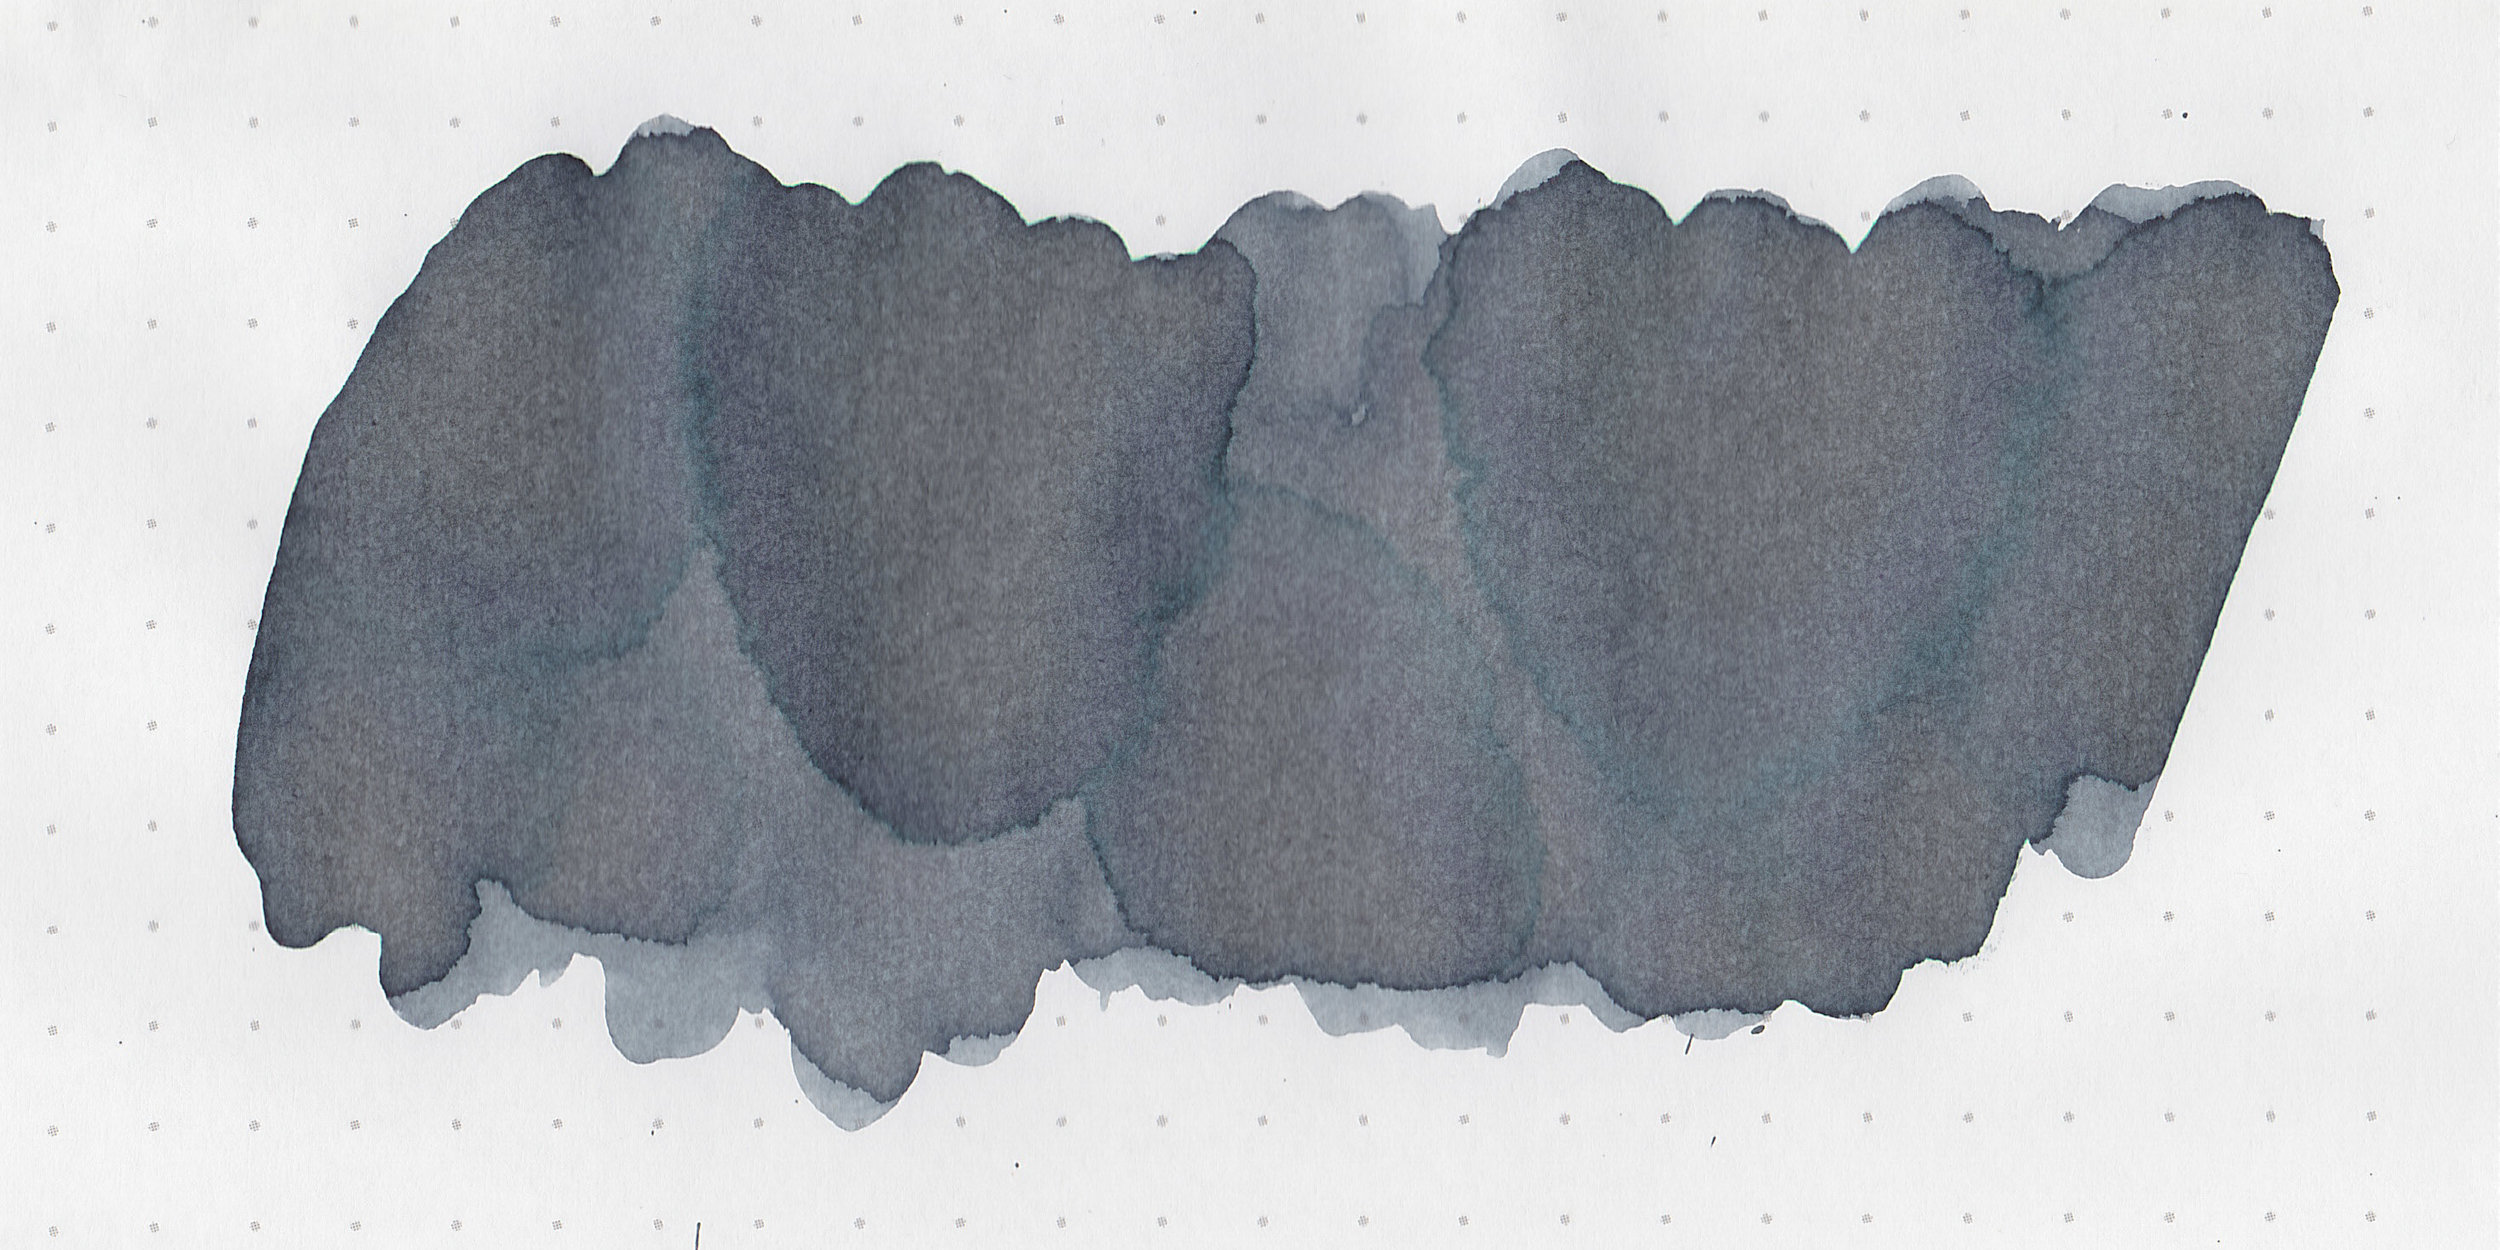 3o-cool-gray-3.jpg